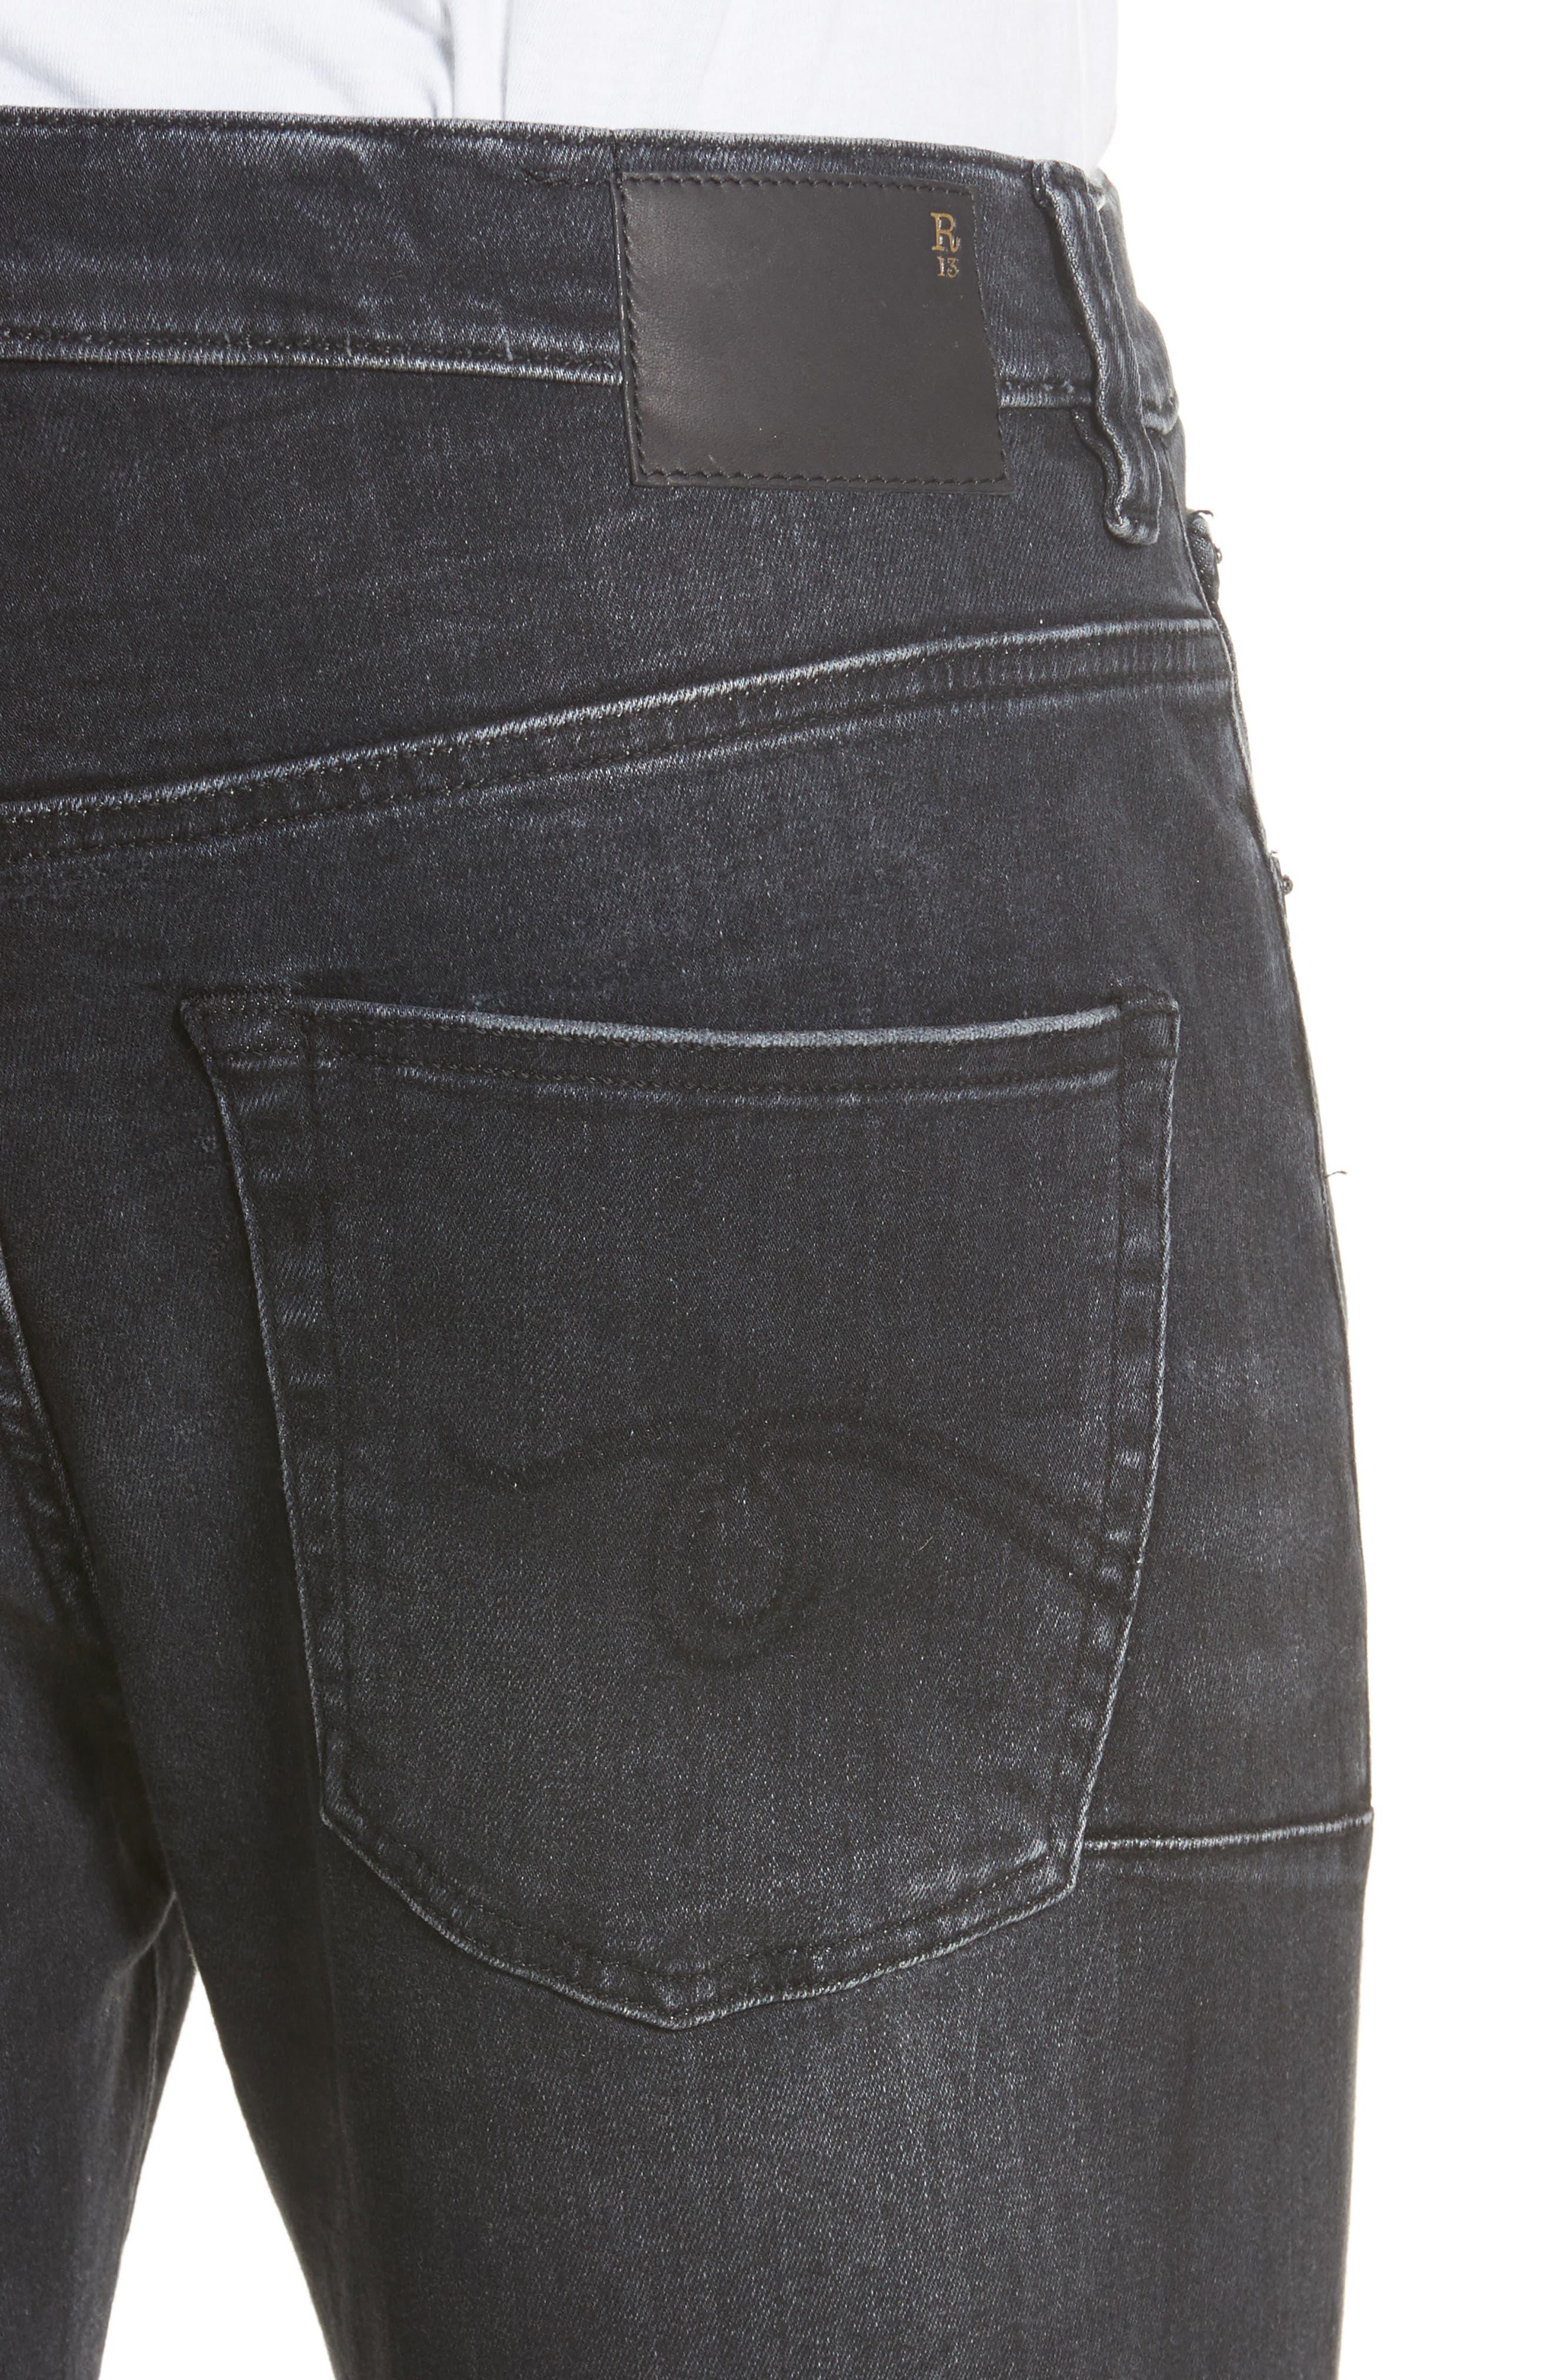 Skate Jeans,                             Alternate thumbnail 4, color,                             BLACK MARBLE